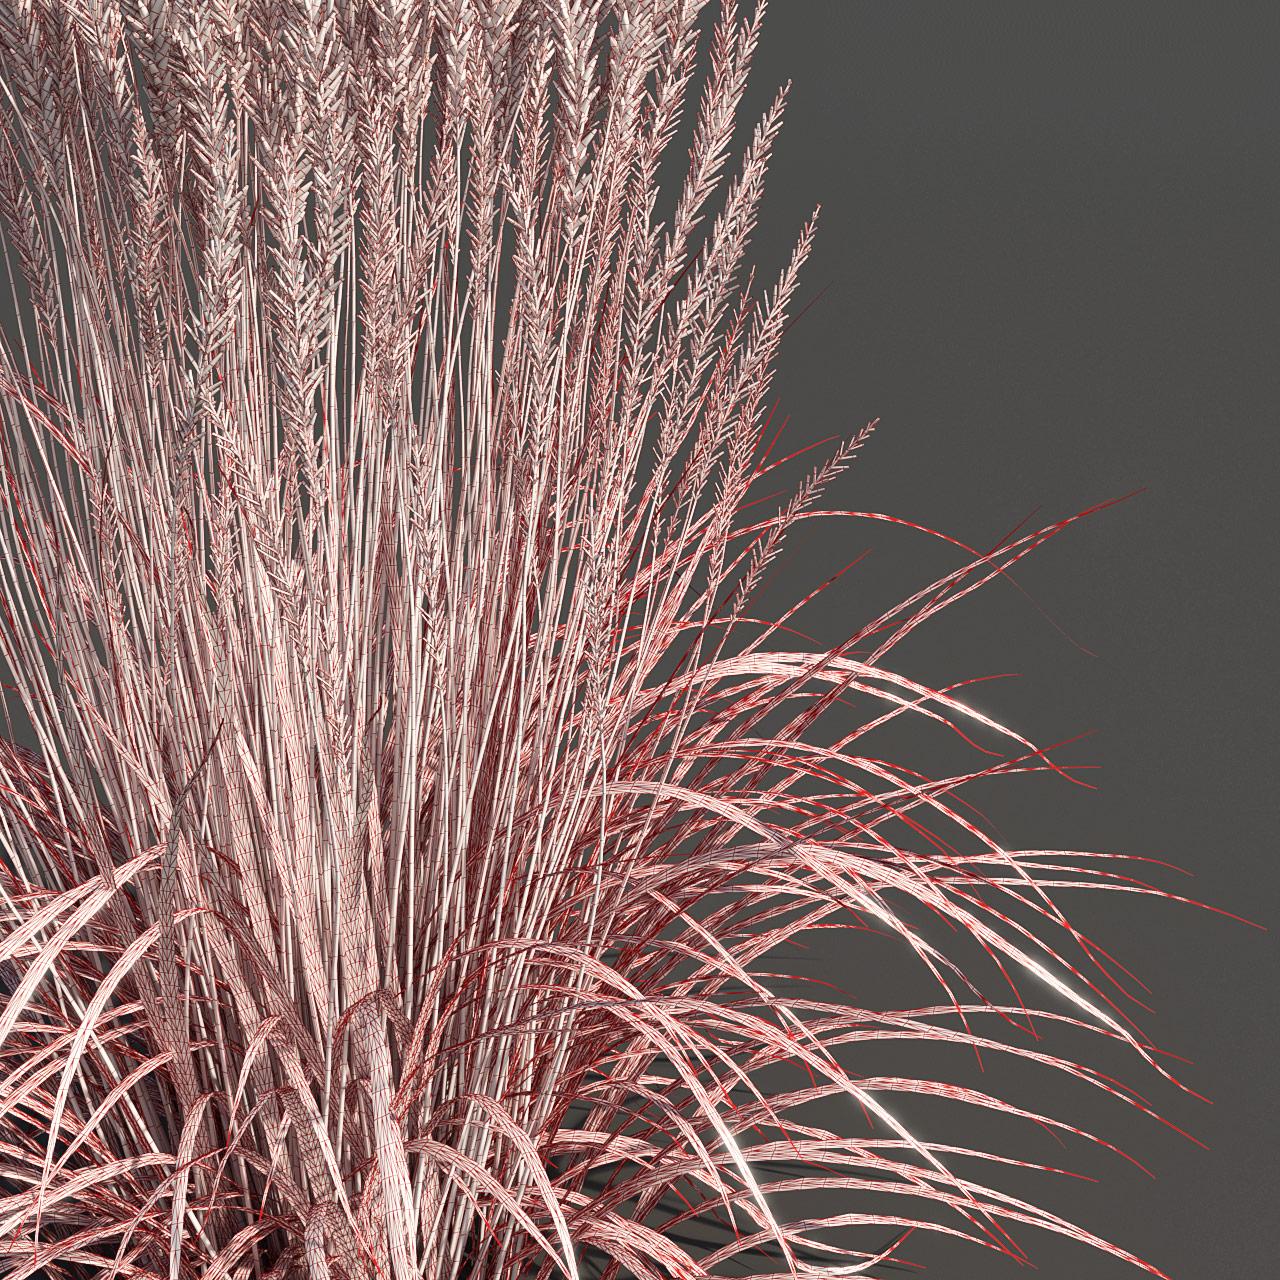 Feather Reed Grass 3D model wireframe - 'Karl Foerster' - Calamagrostis acutiflora